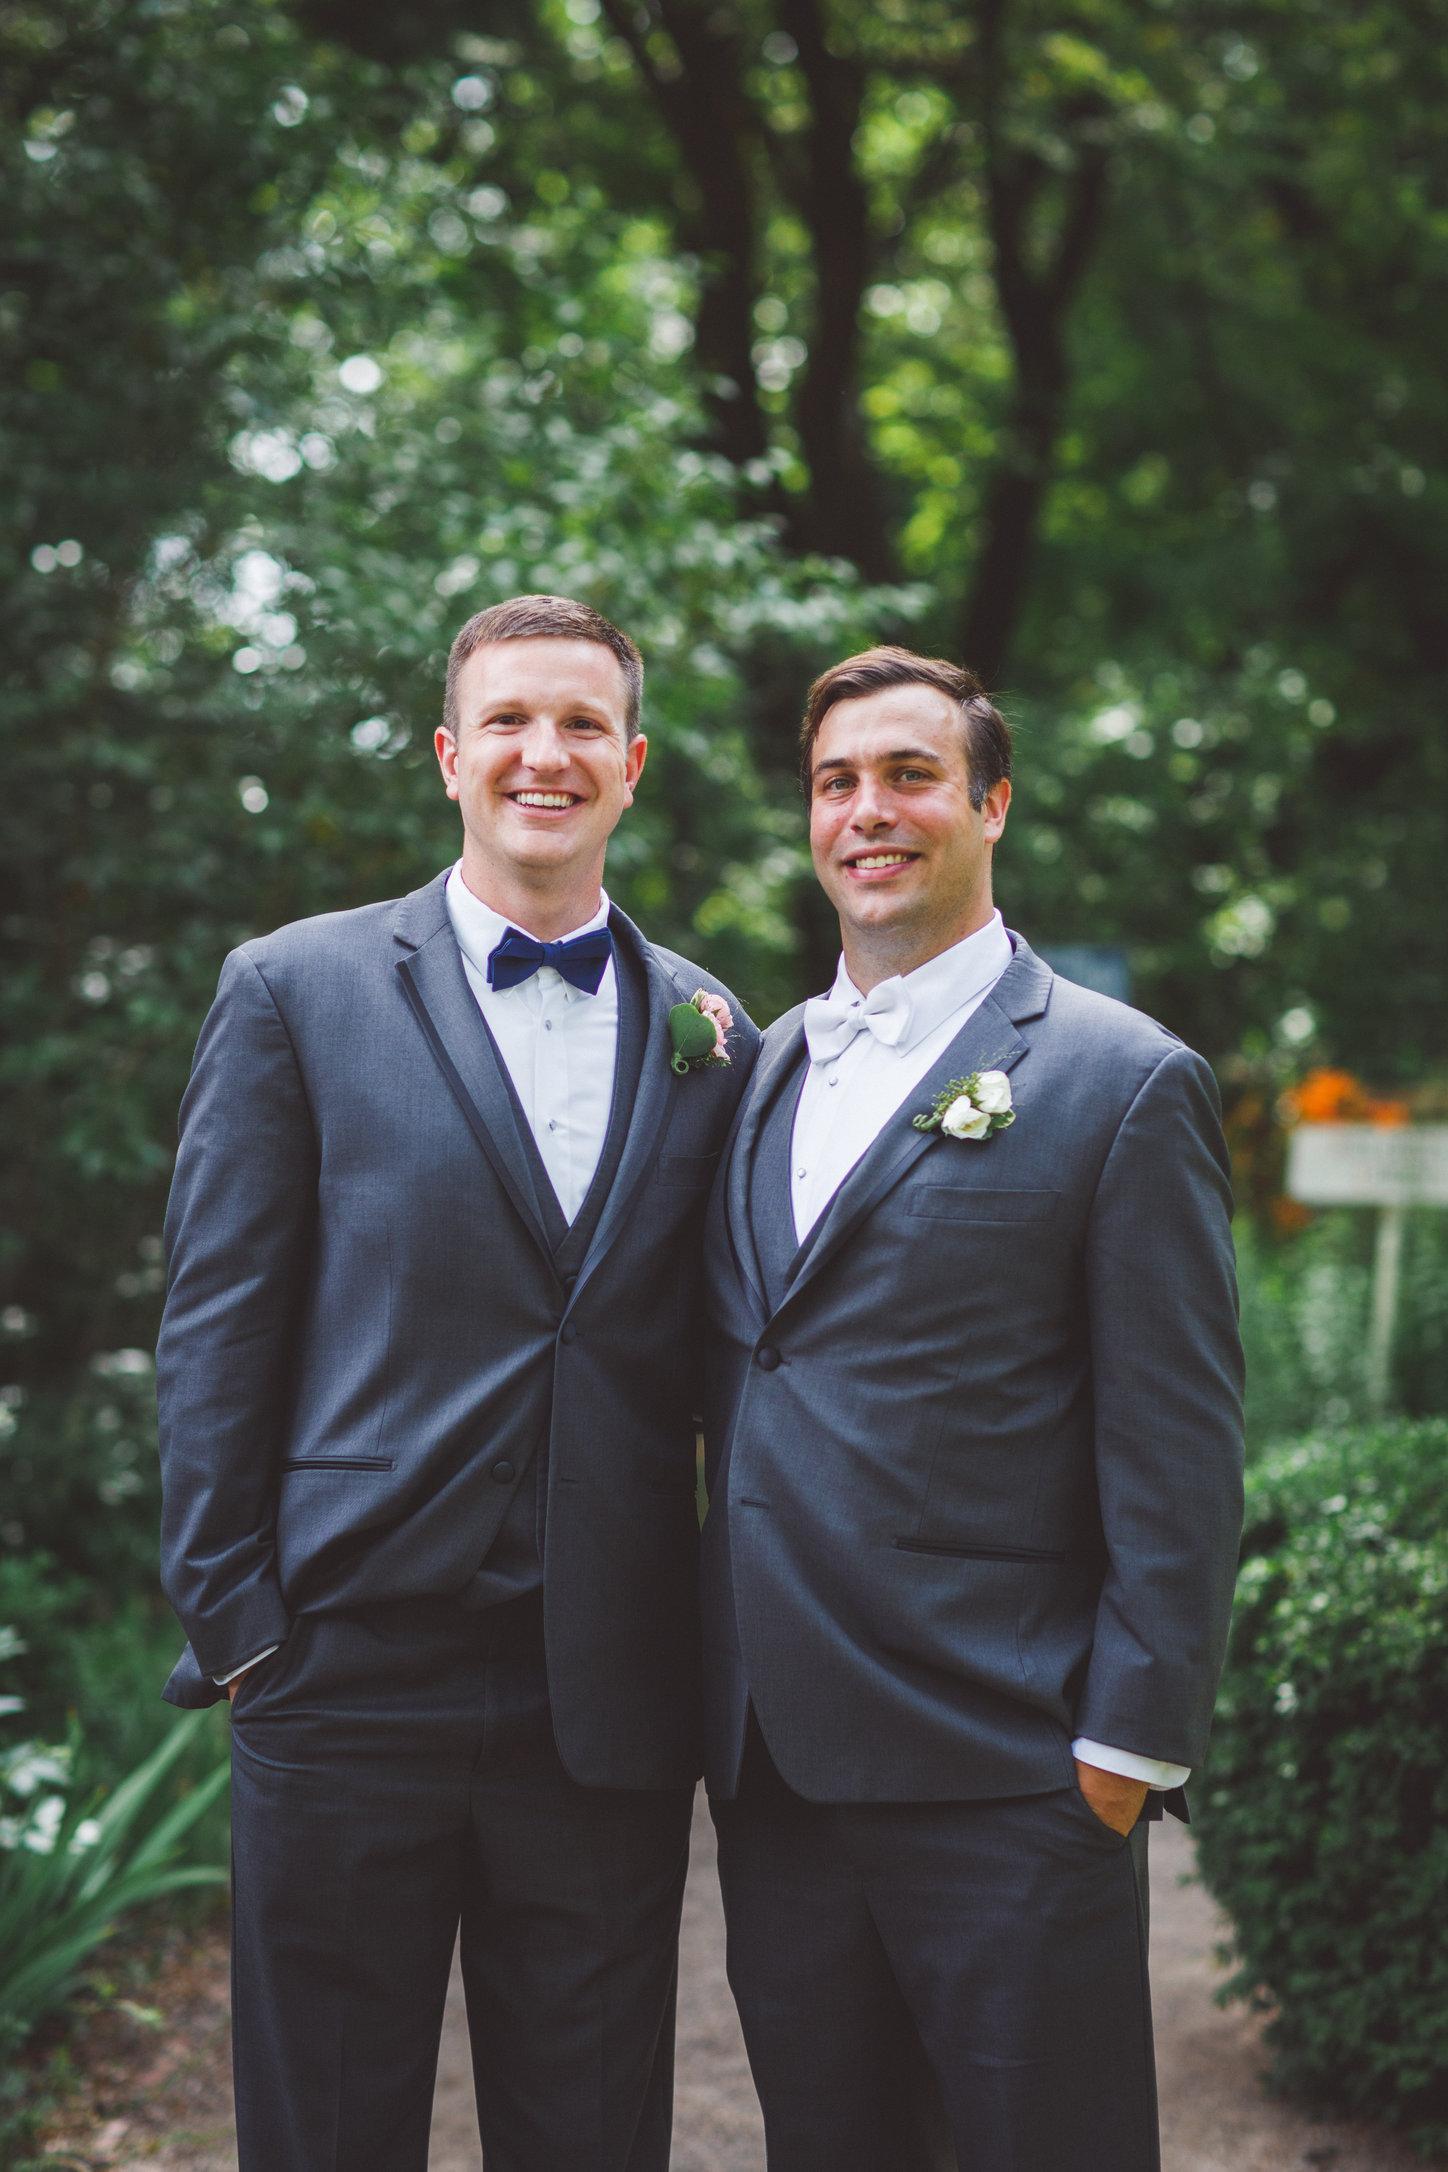 SandC-wedding-357.jpg